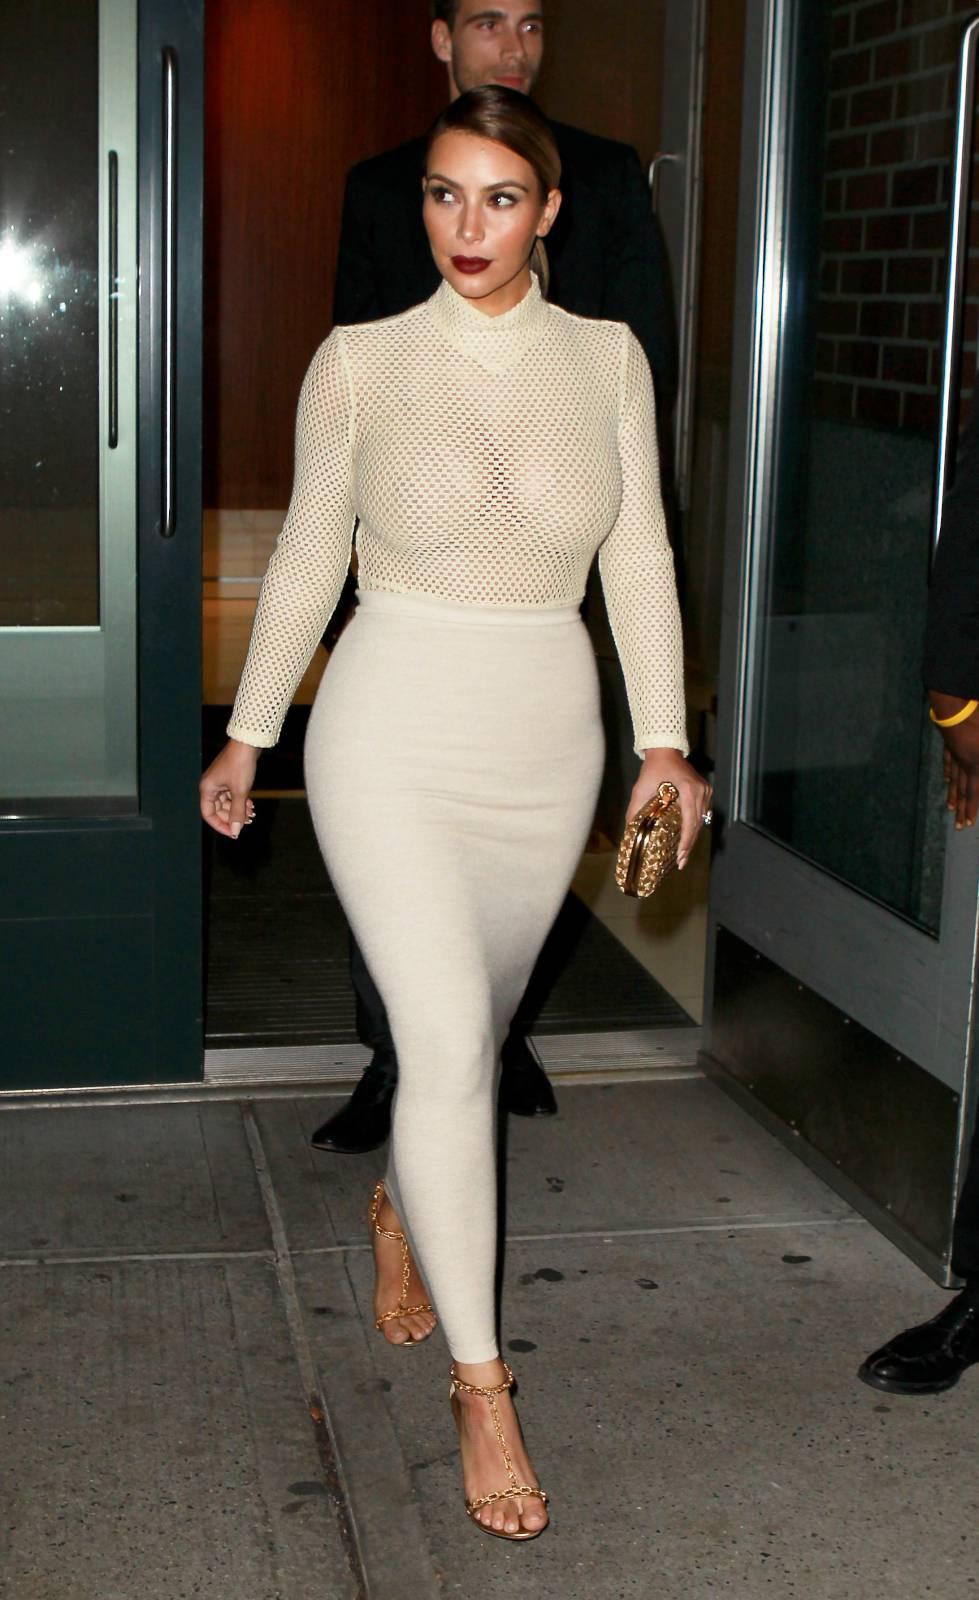 904208609_Kim_Kardashian_191113_ReSiDuO6_123_101lo.jpg